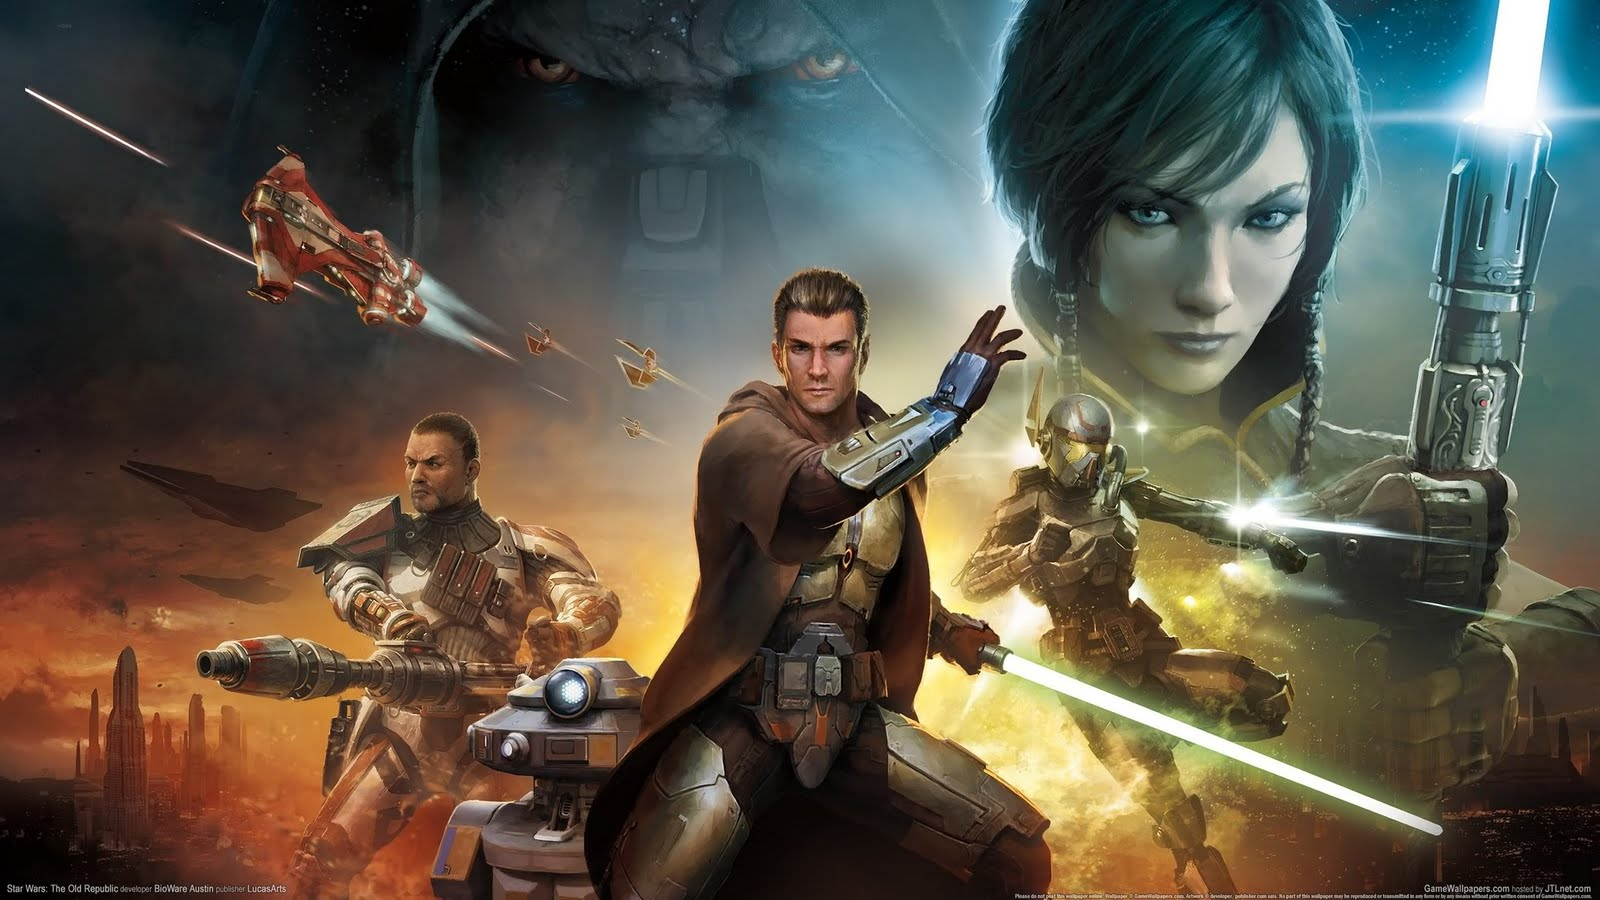 Star wars republic commando order 66 - 379